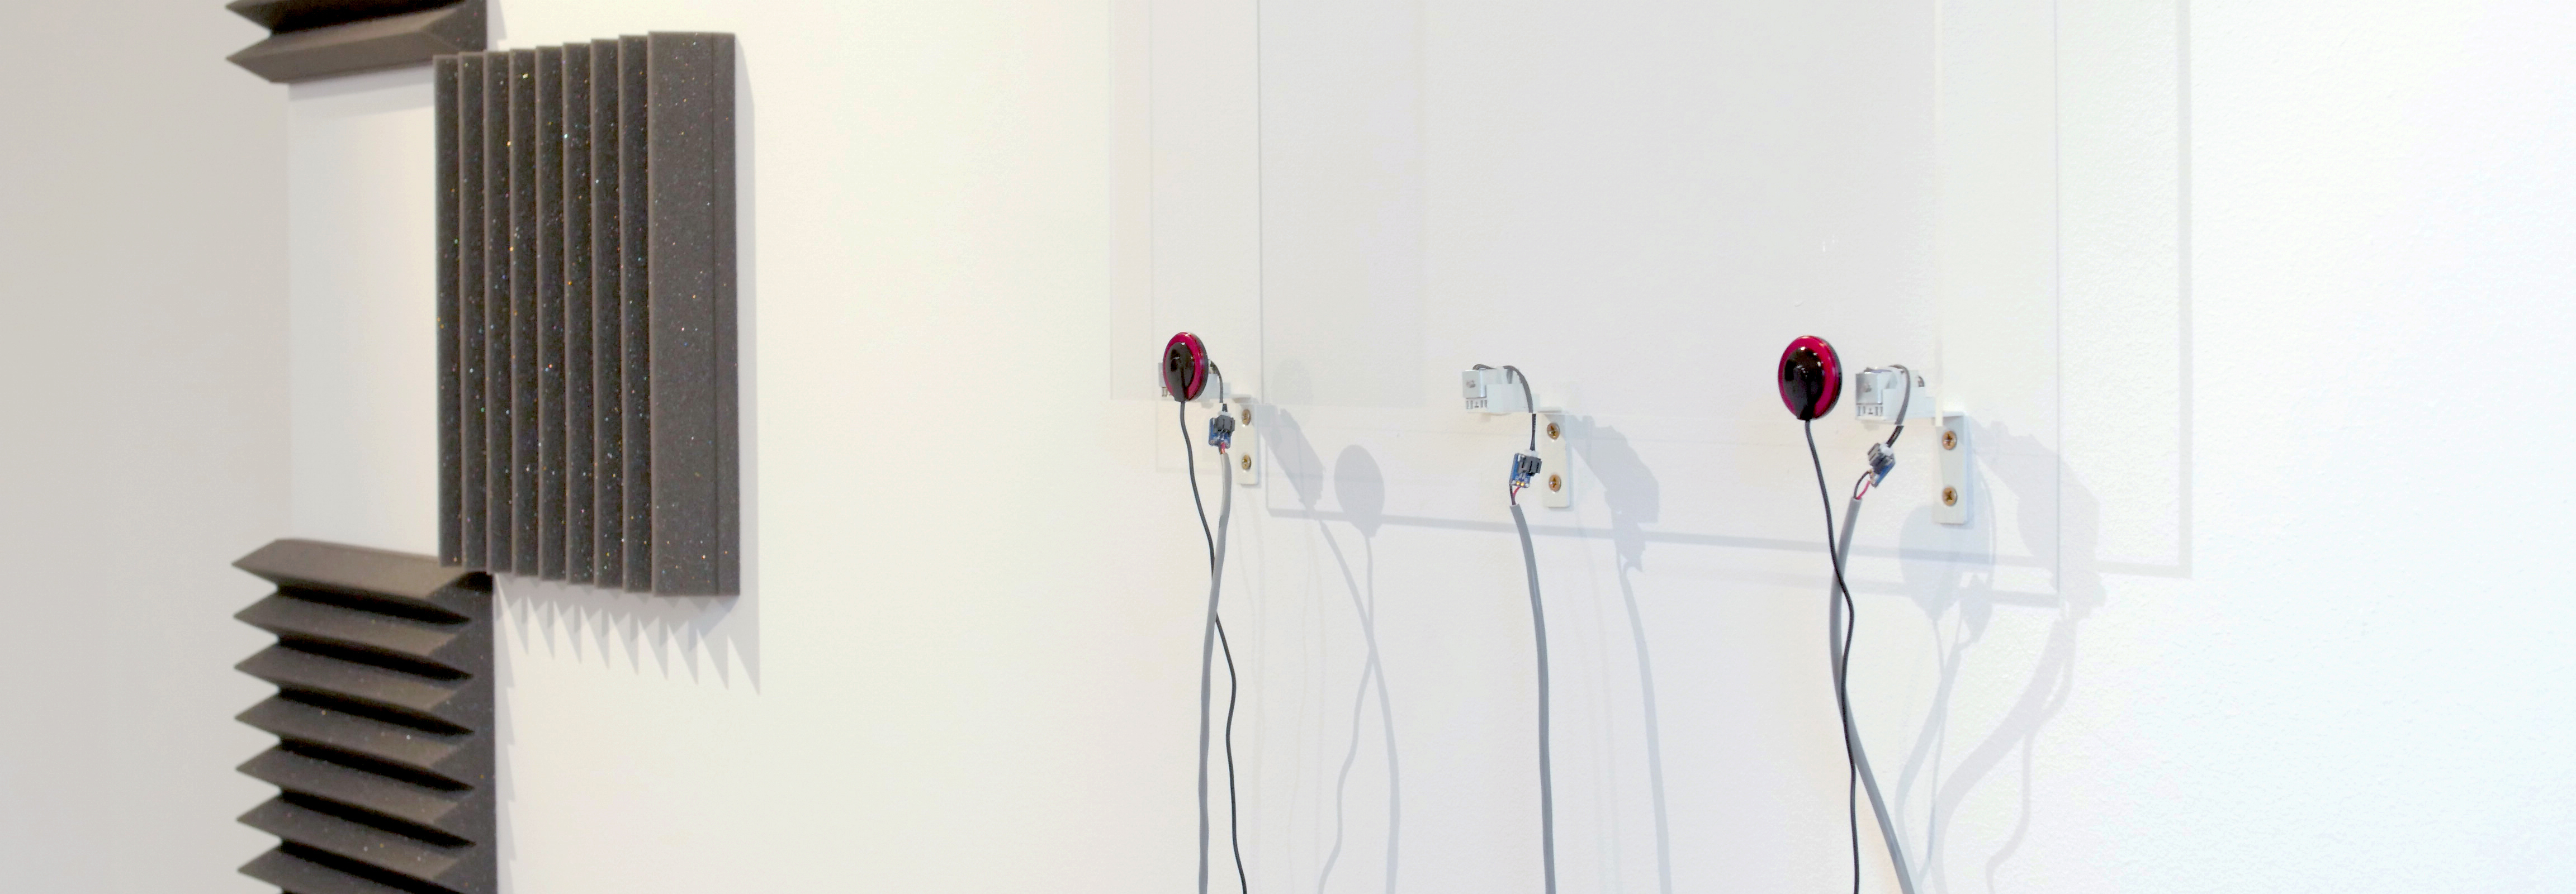 work by Jonas Pequenos